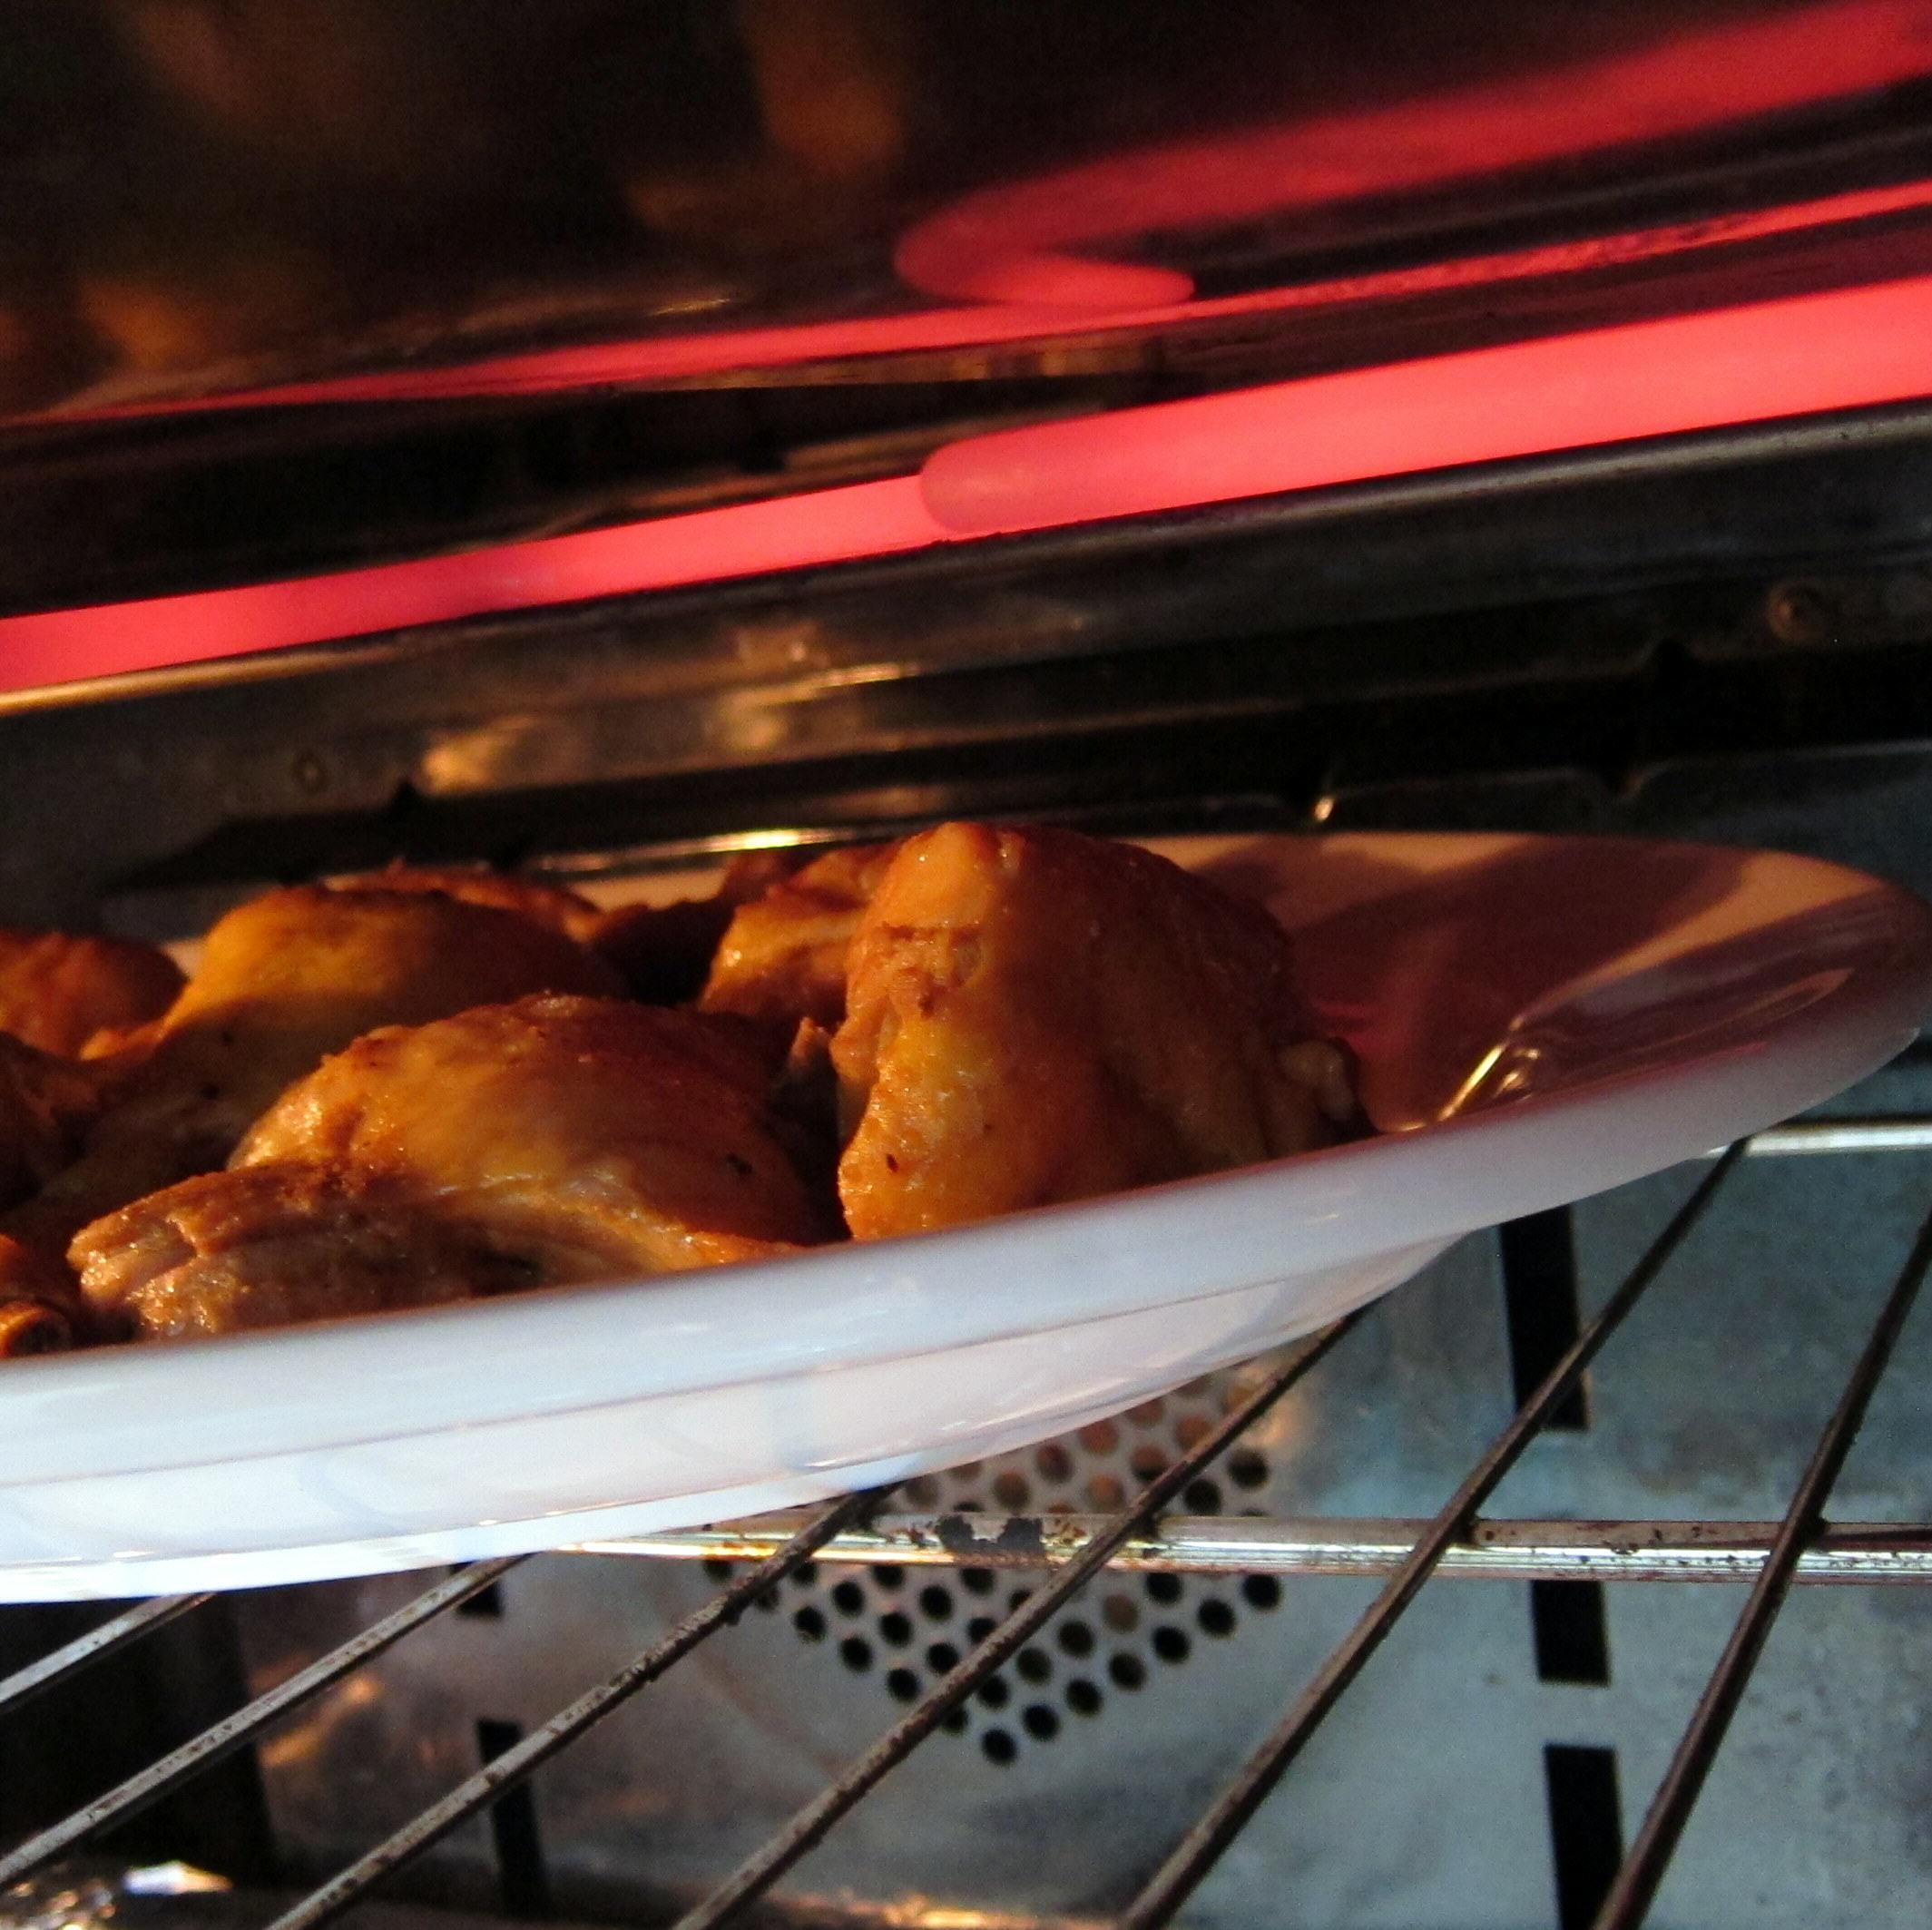 brown or broil pressure cooked meat